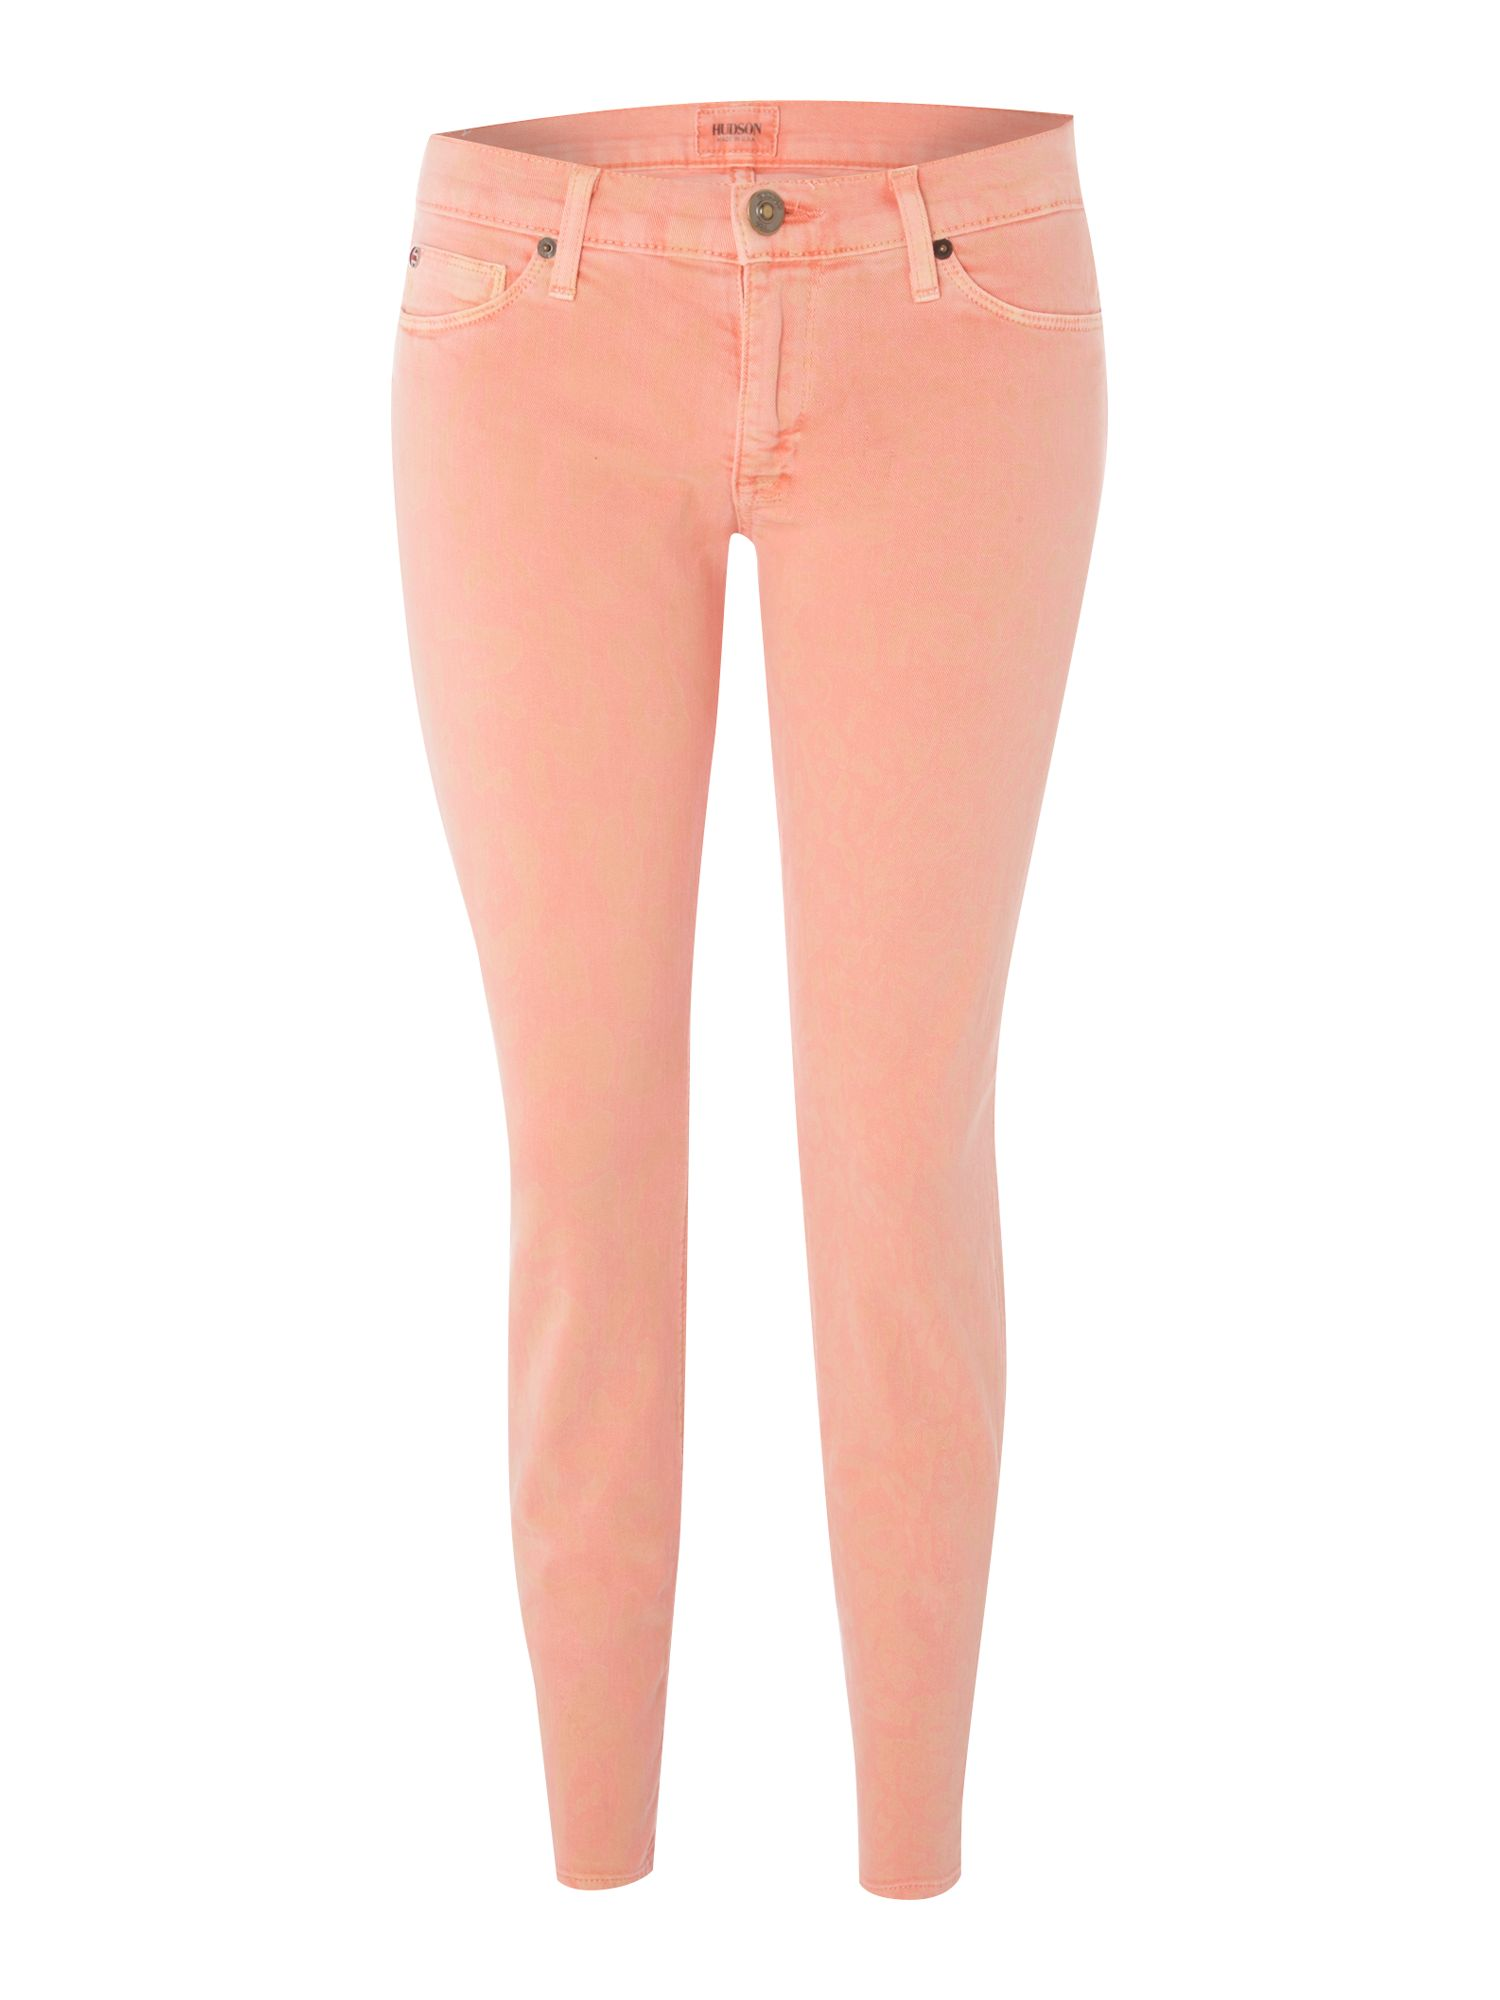 Hudson jeans Skinny Leopard Print Coloured Jeans | Lyst